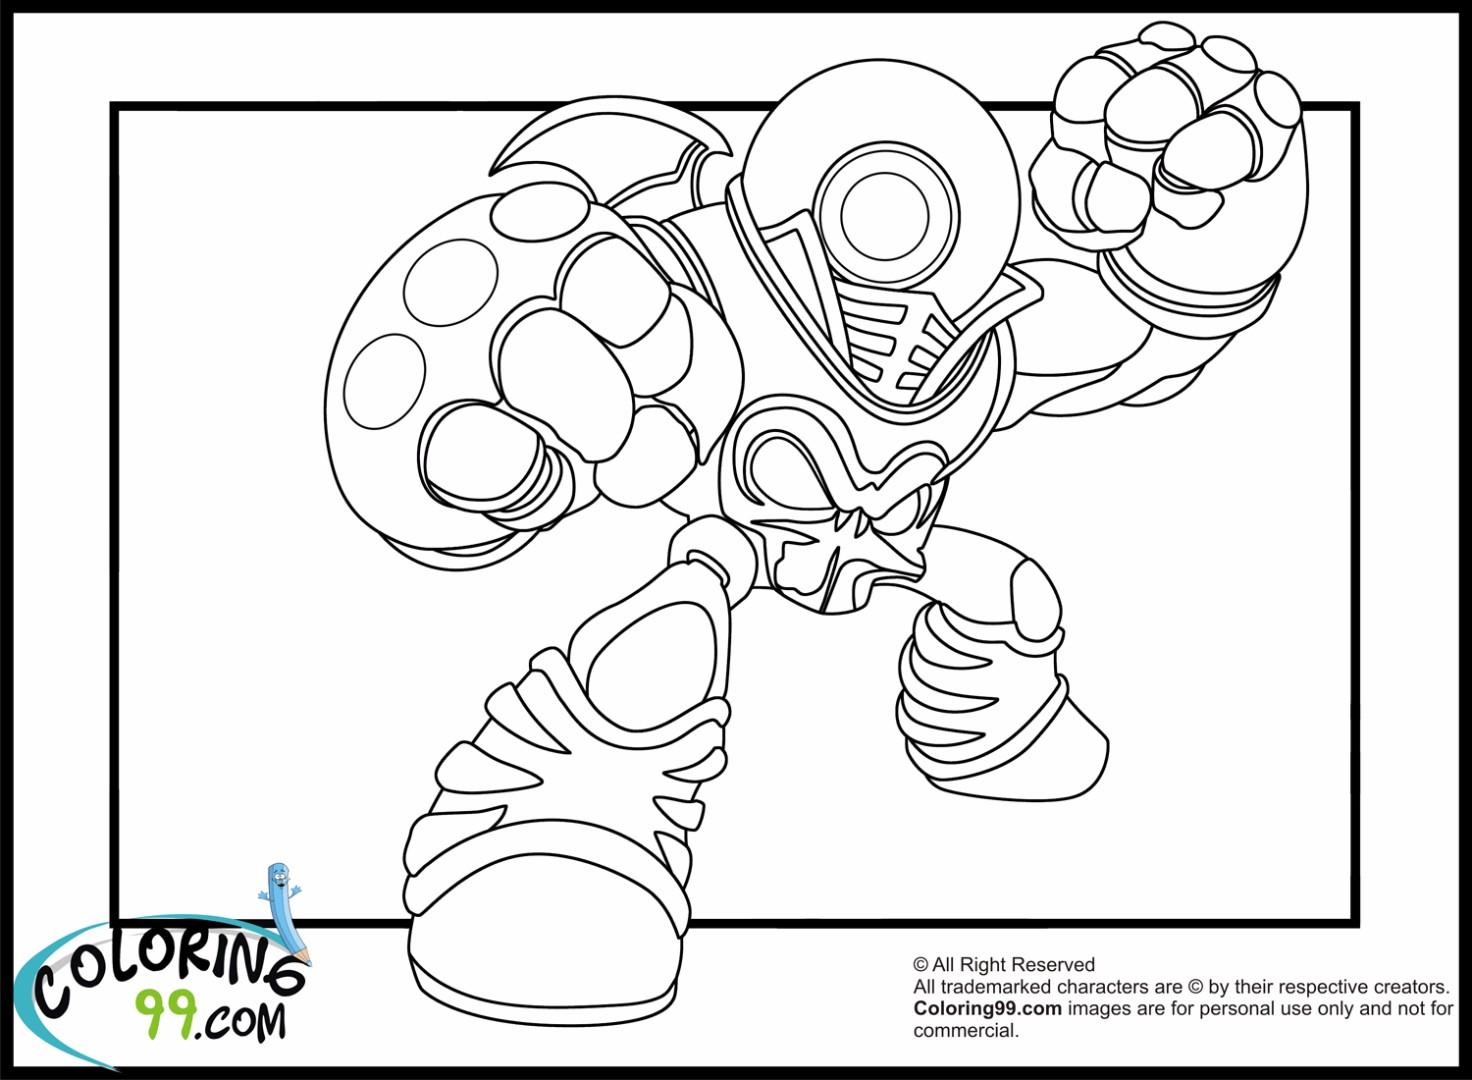 Skylander giant coloring pages - Coloriage eye brawl ...